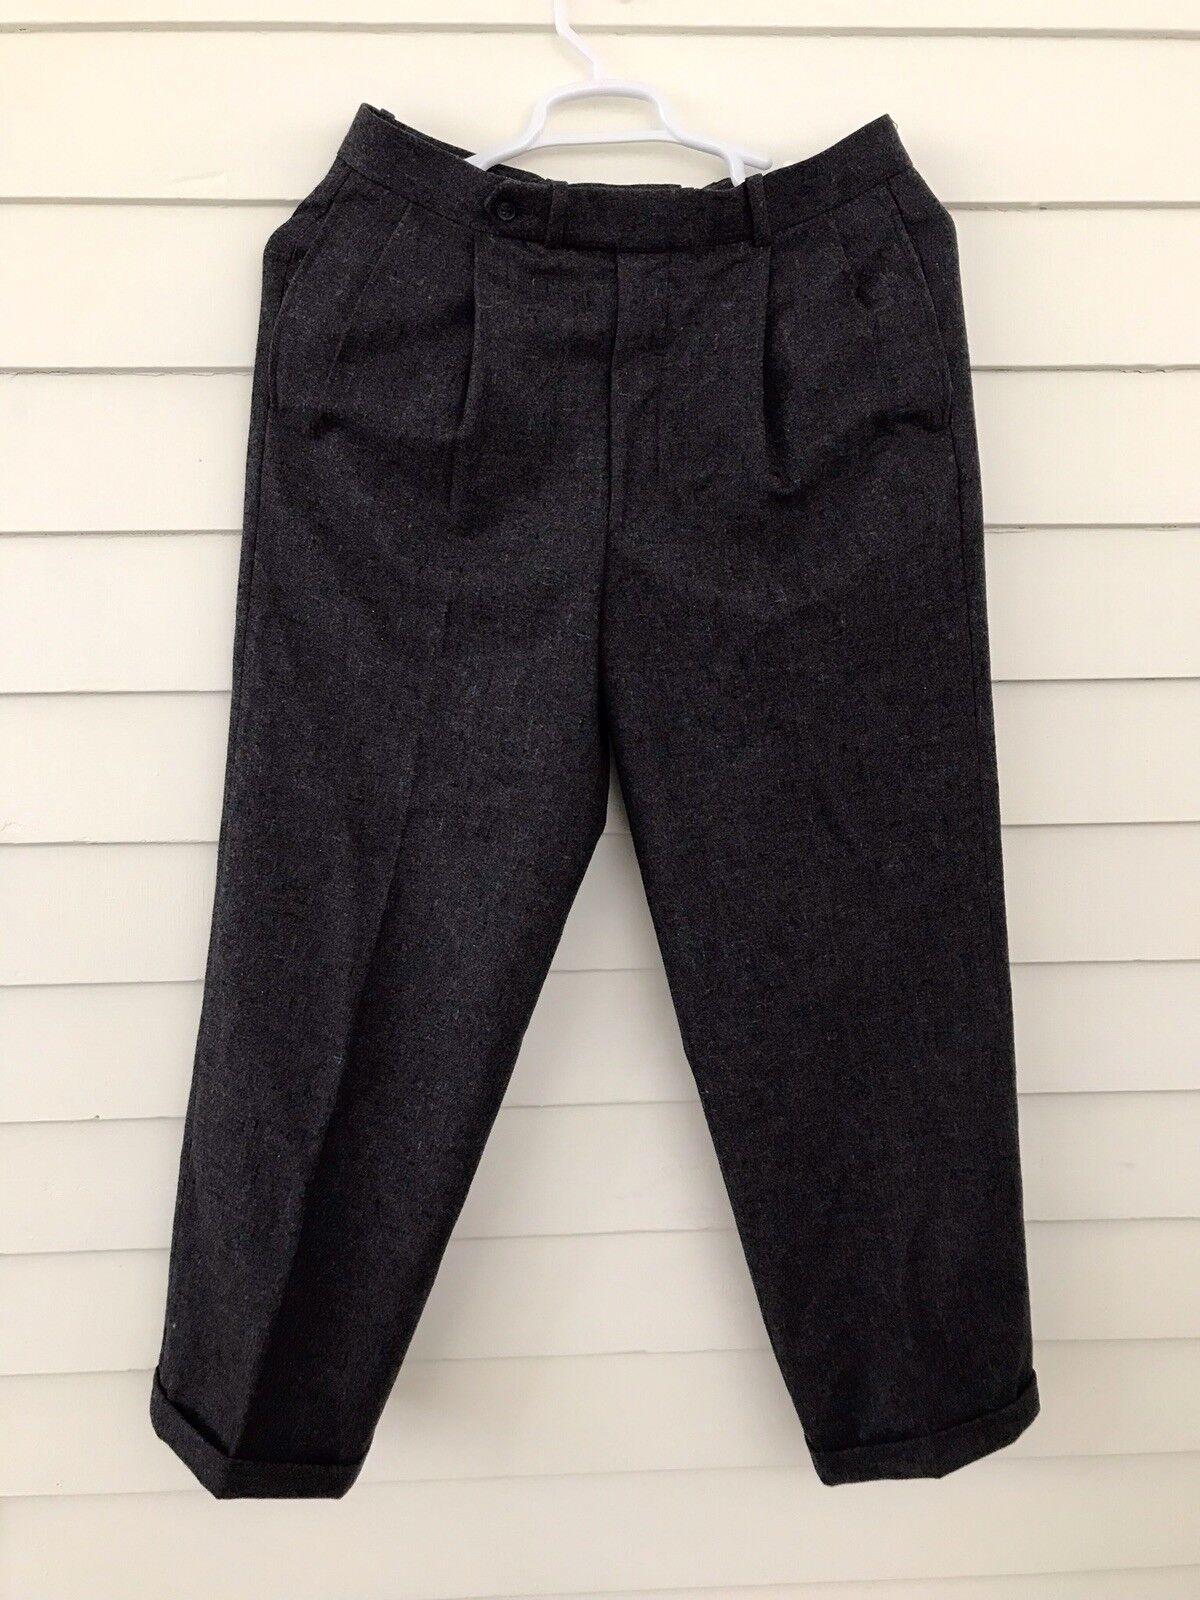 Men's F.lli Garlanda Pants 33 100% Virgin Wool  Tailored In Korea Pleated